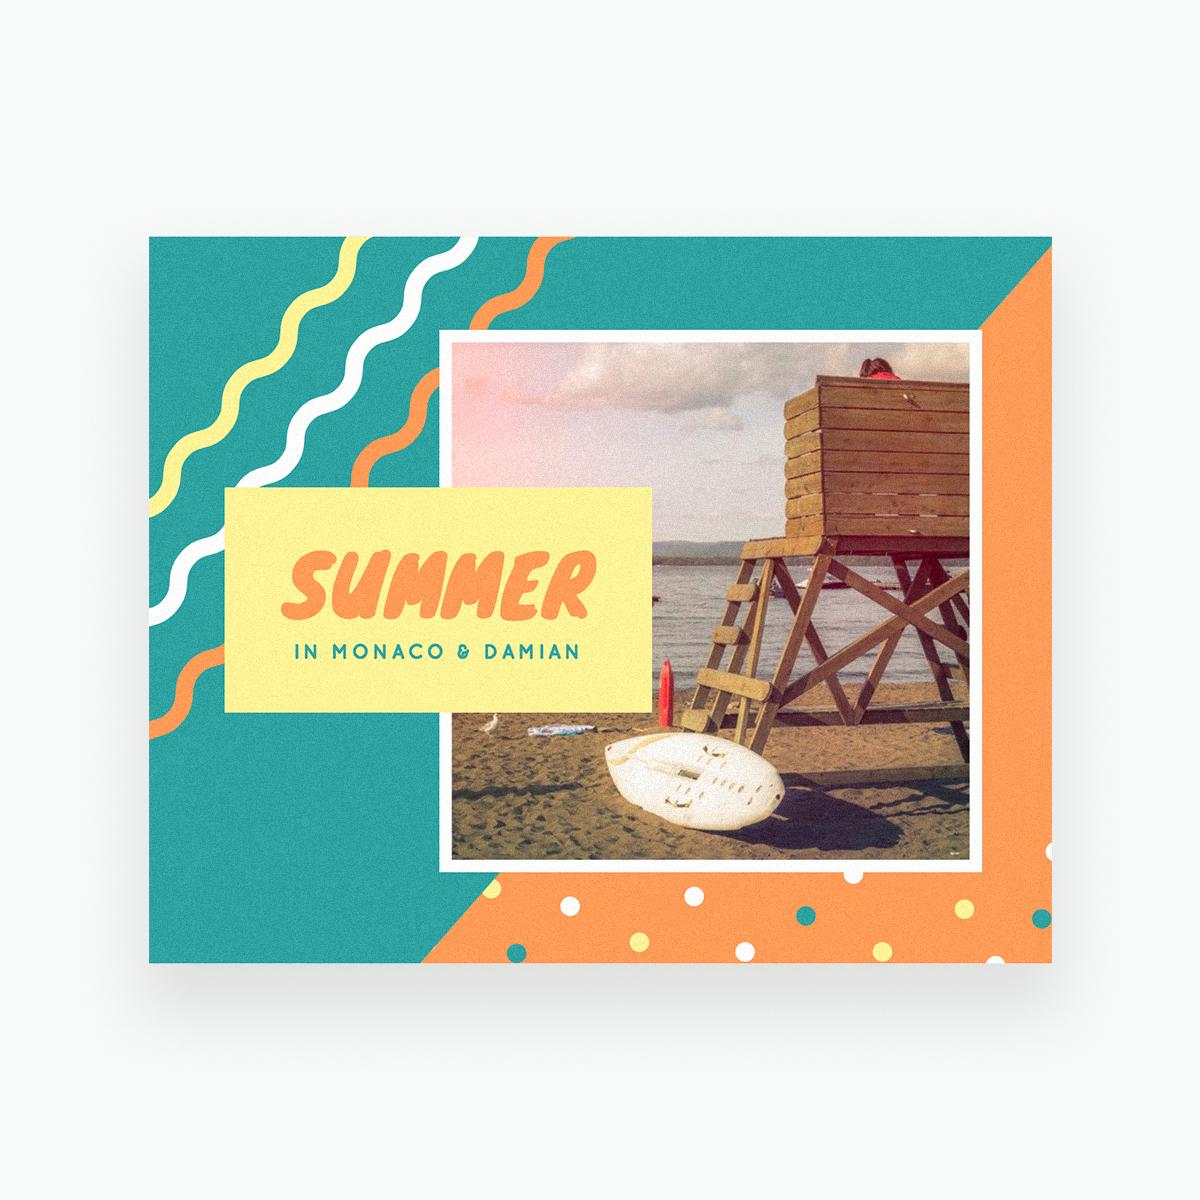 Free Online Scrapbook Maker: Create Custom Designs Online | Canva - Free Printable Scrapbook Pages Online